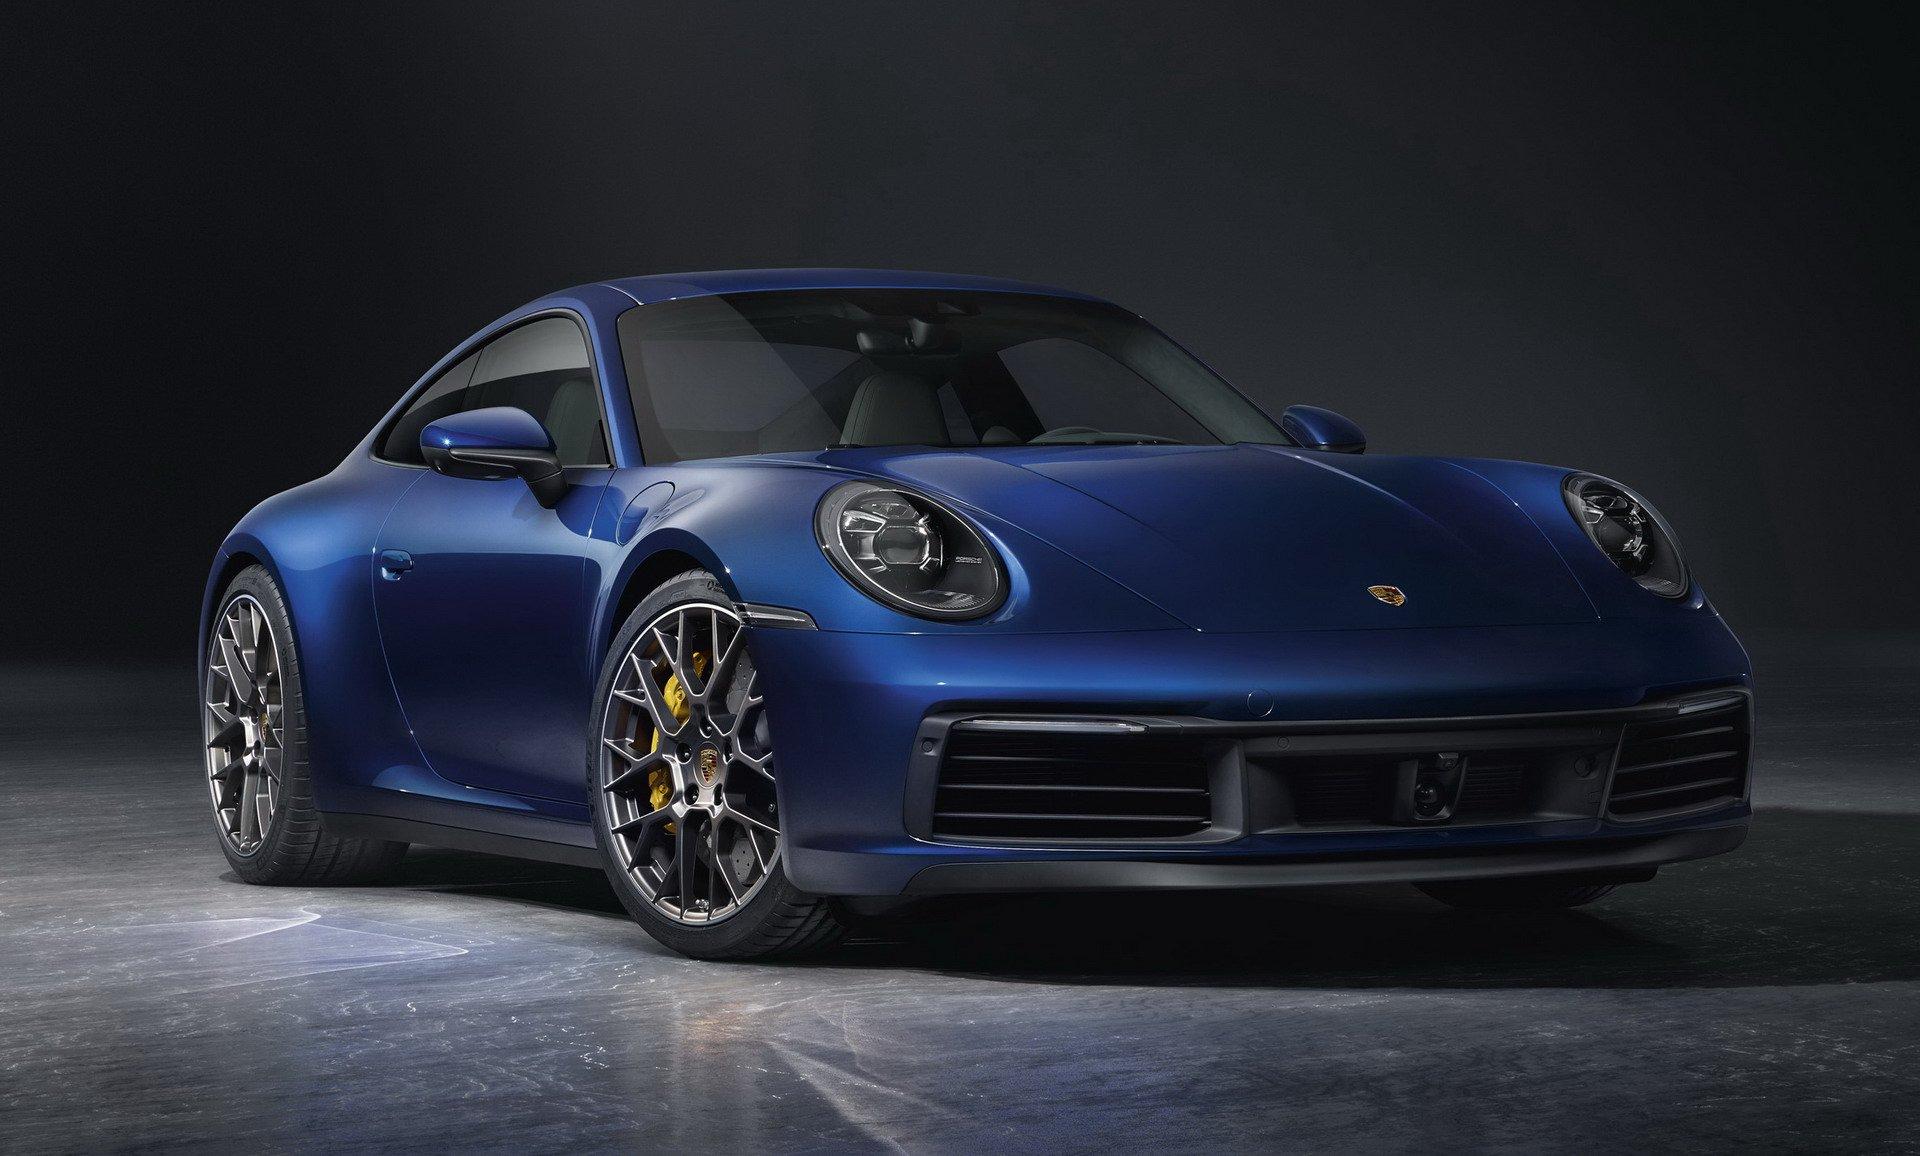 2020 Porsche 911 carrera 4S blue